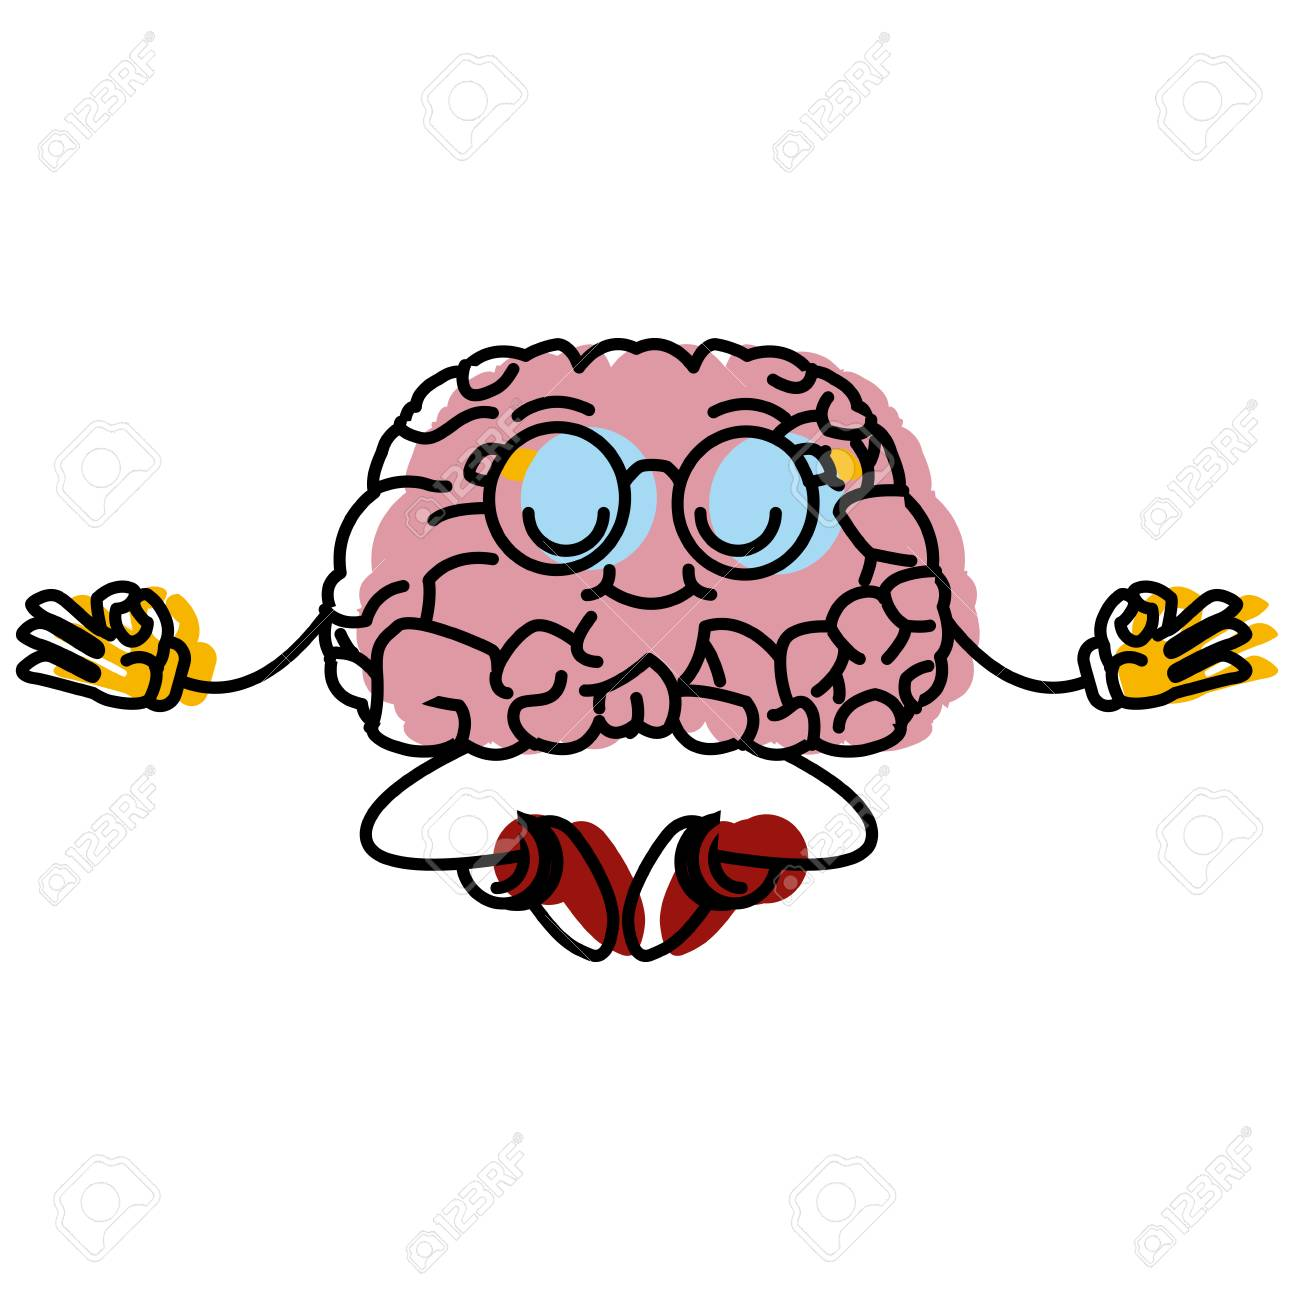 cute brain meditating cartoon icon vector illustration graphic royalty free cliparts vectors and stock illustration image 87465402 cute brain meditating cartoon icon vector illustration graphic